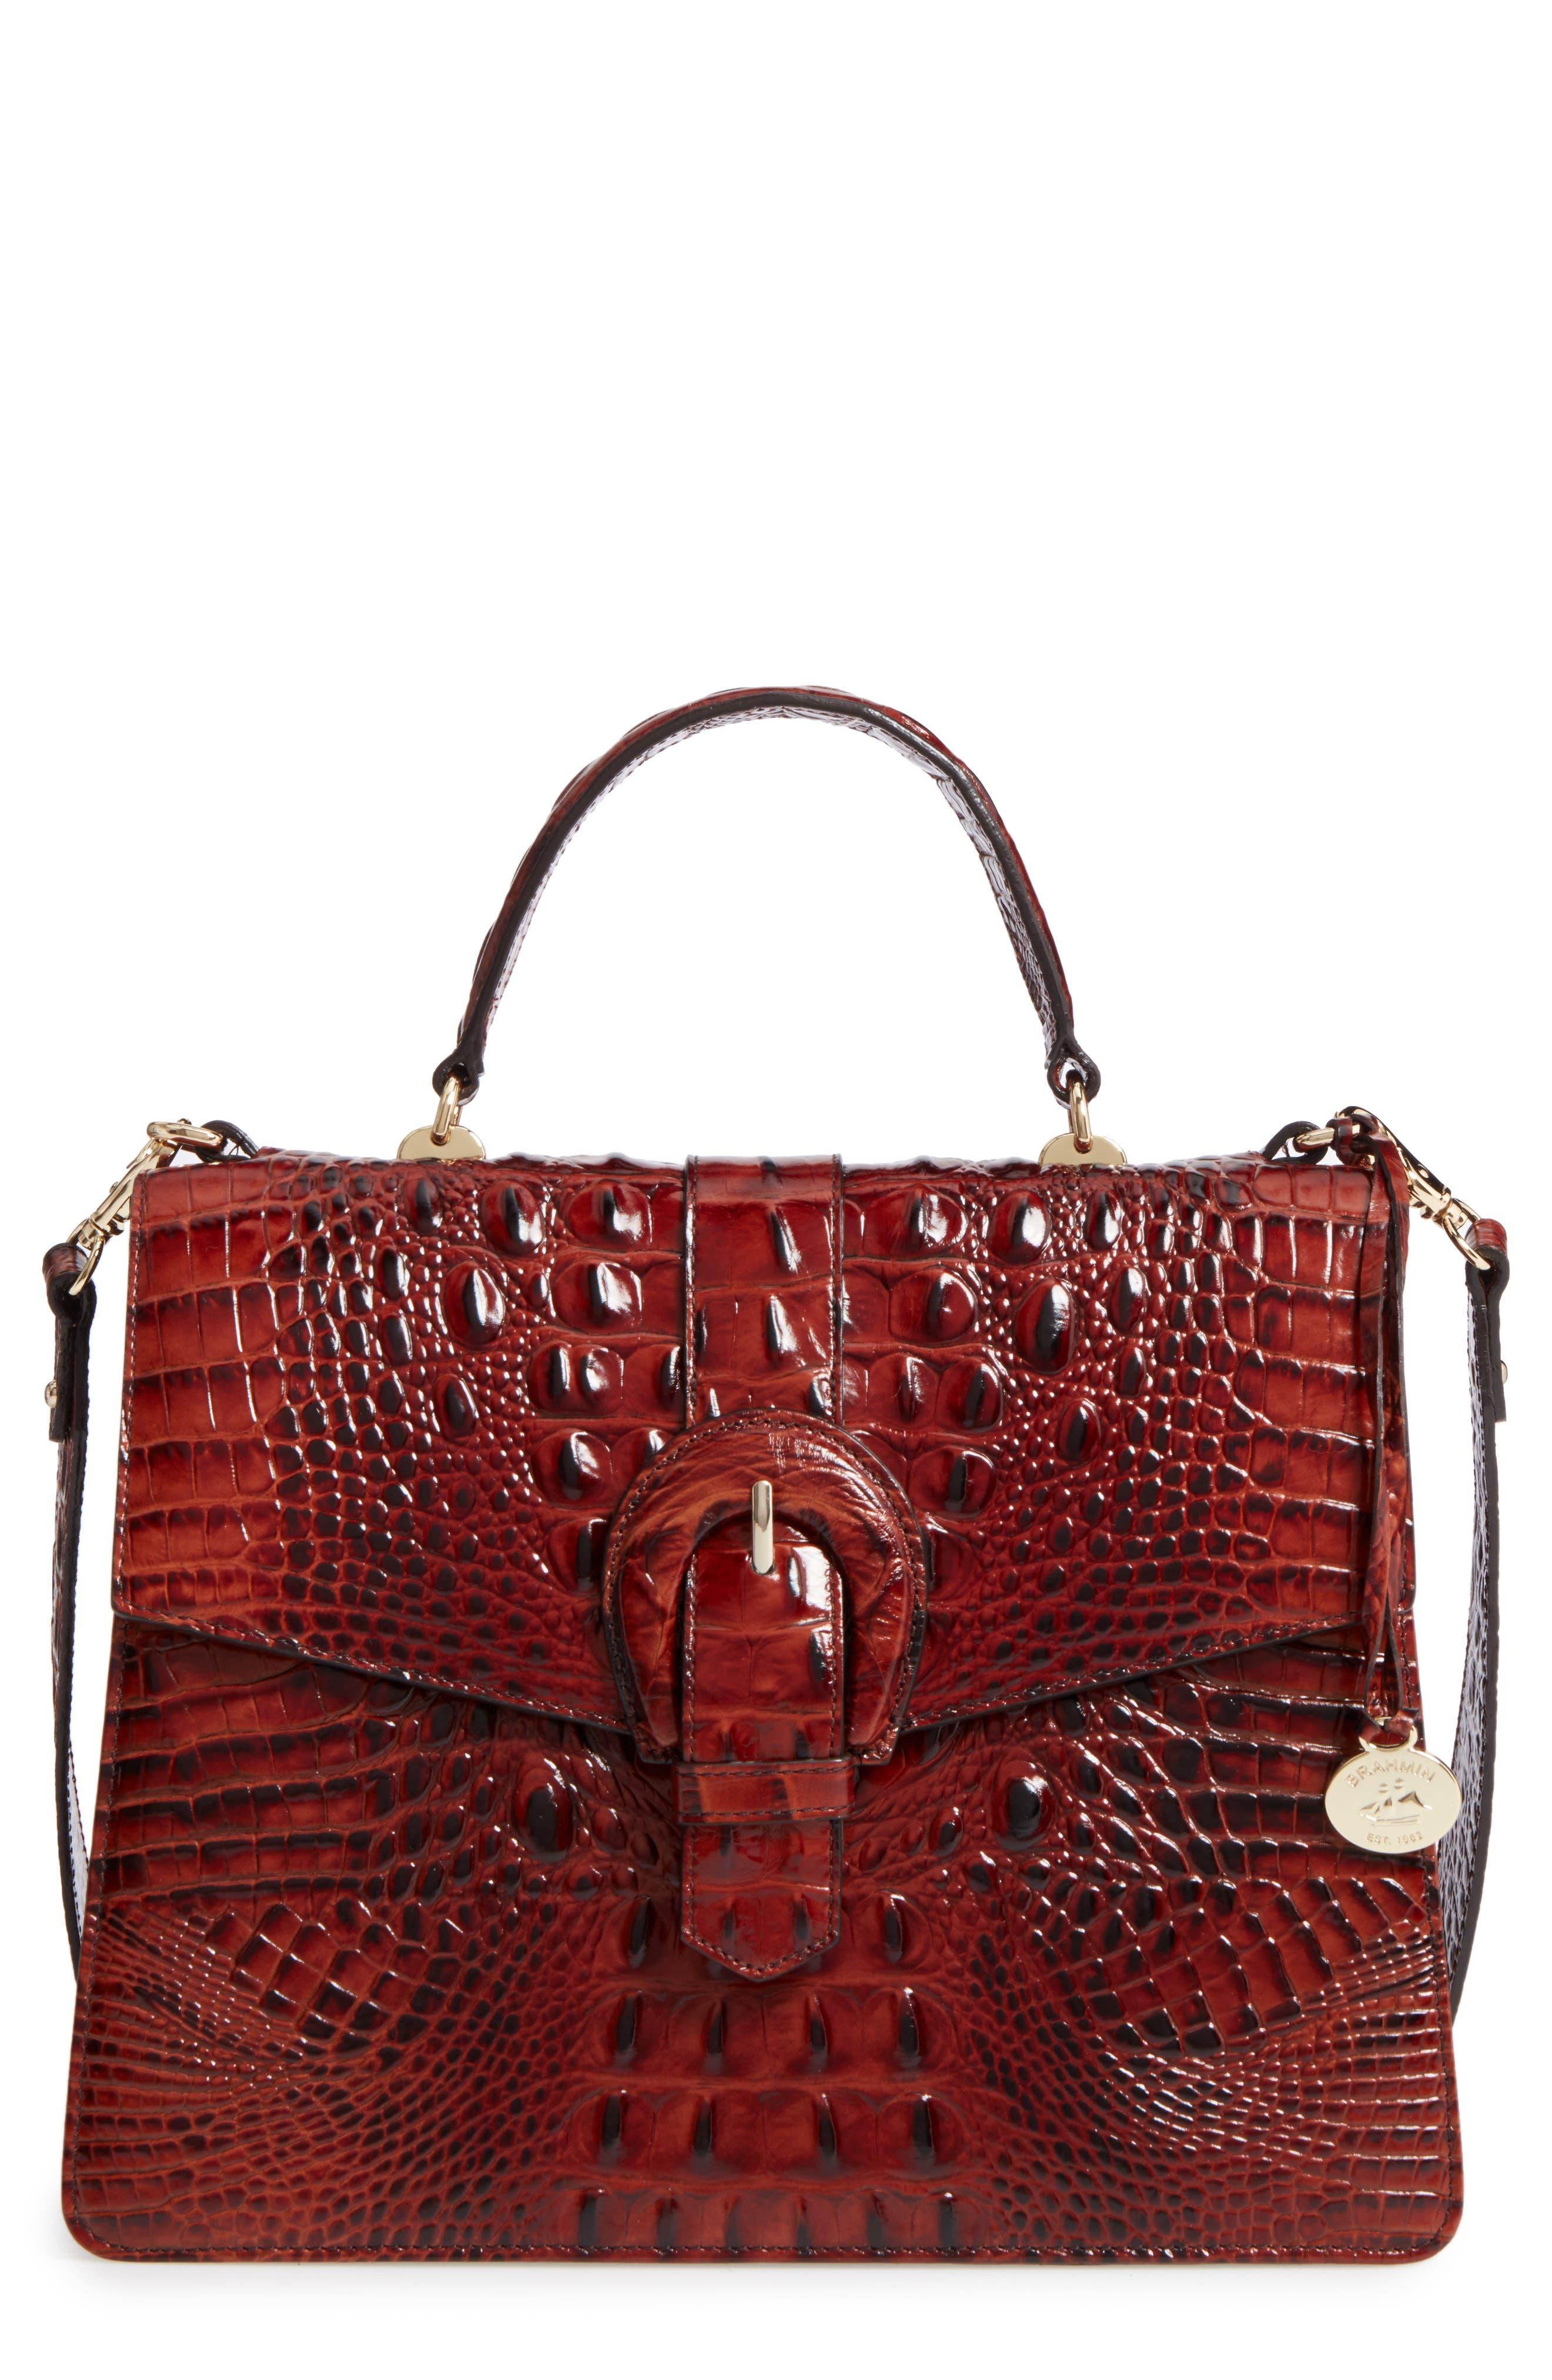 Main Image - Brahmin Melbourne Gabriella Embossed Leather Satchel